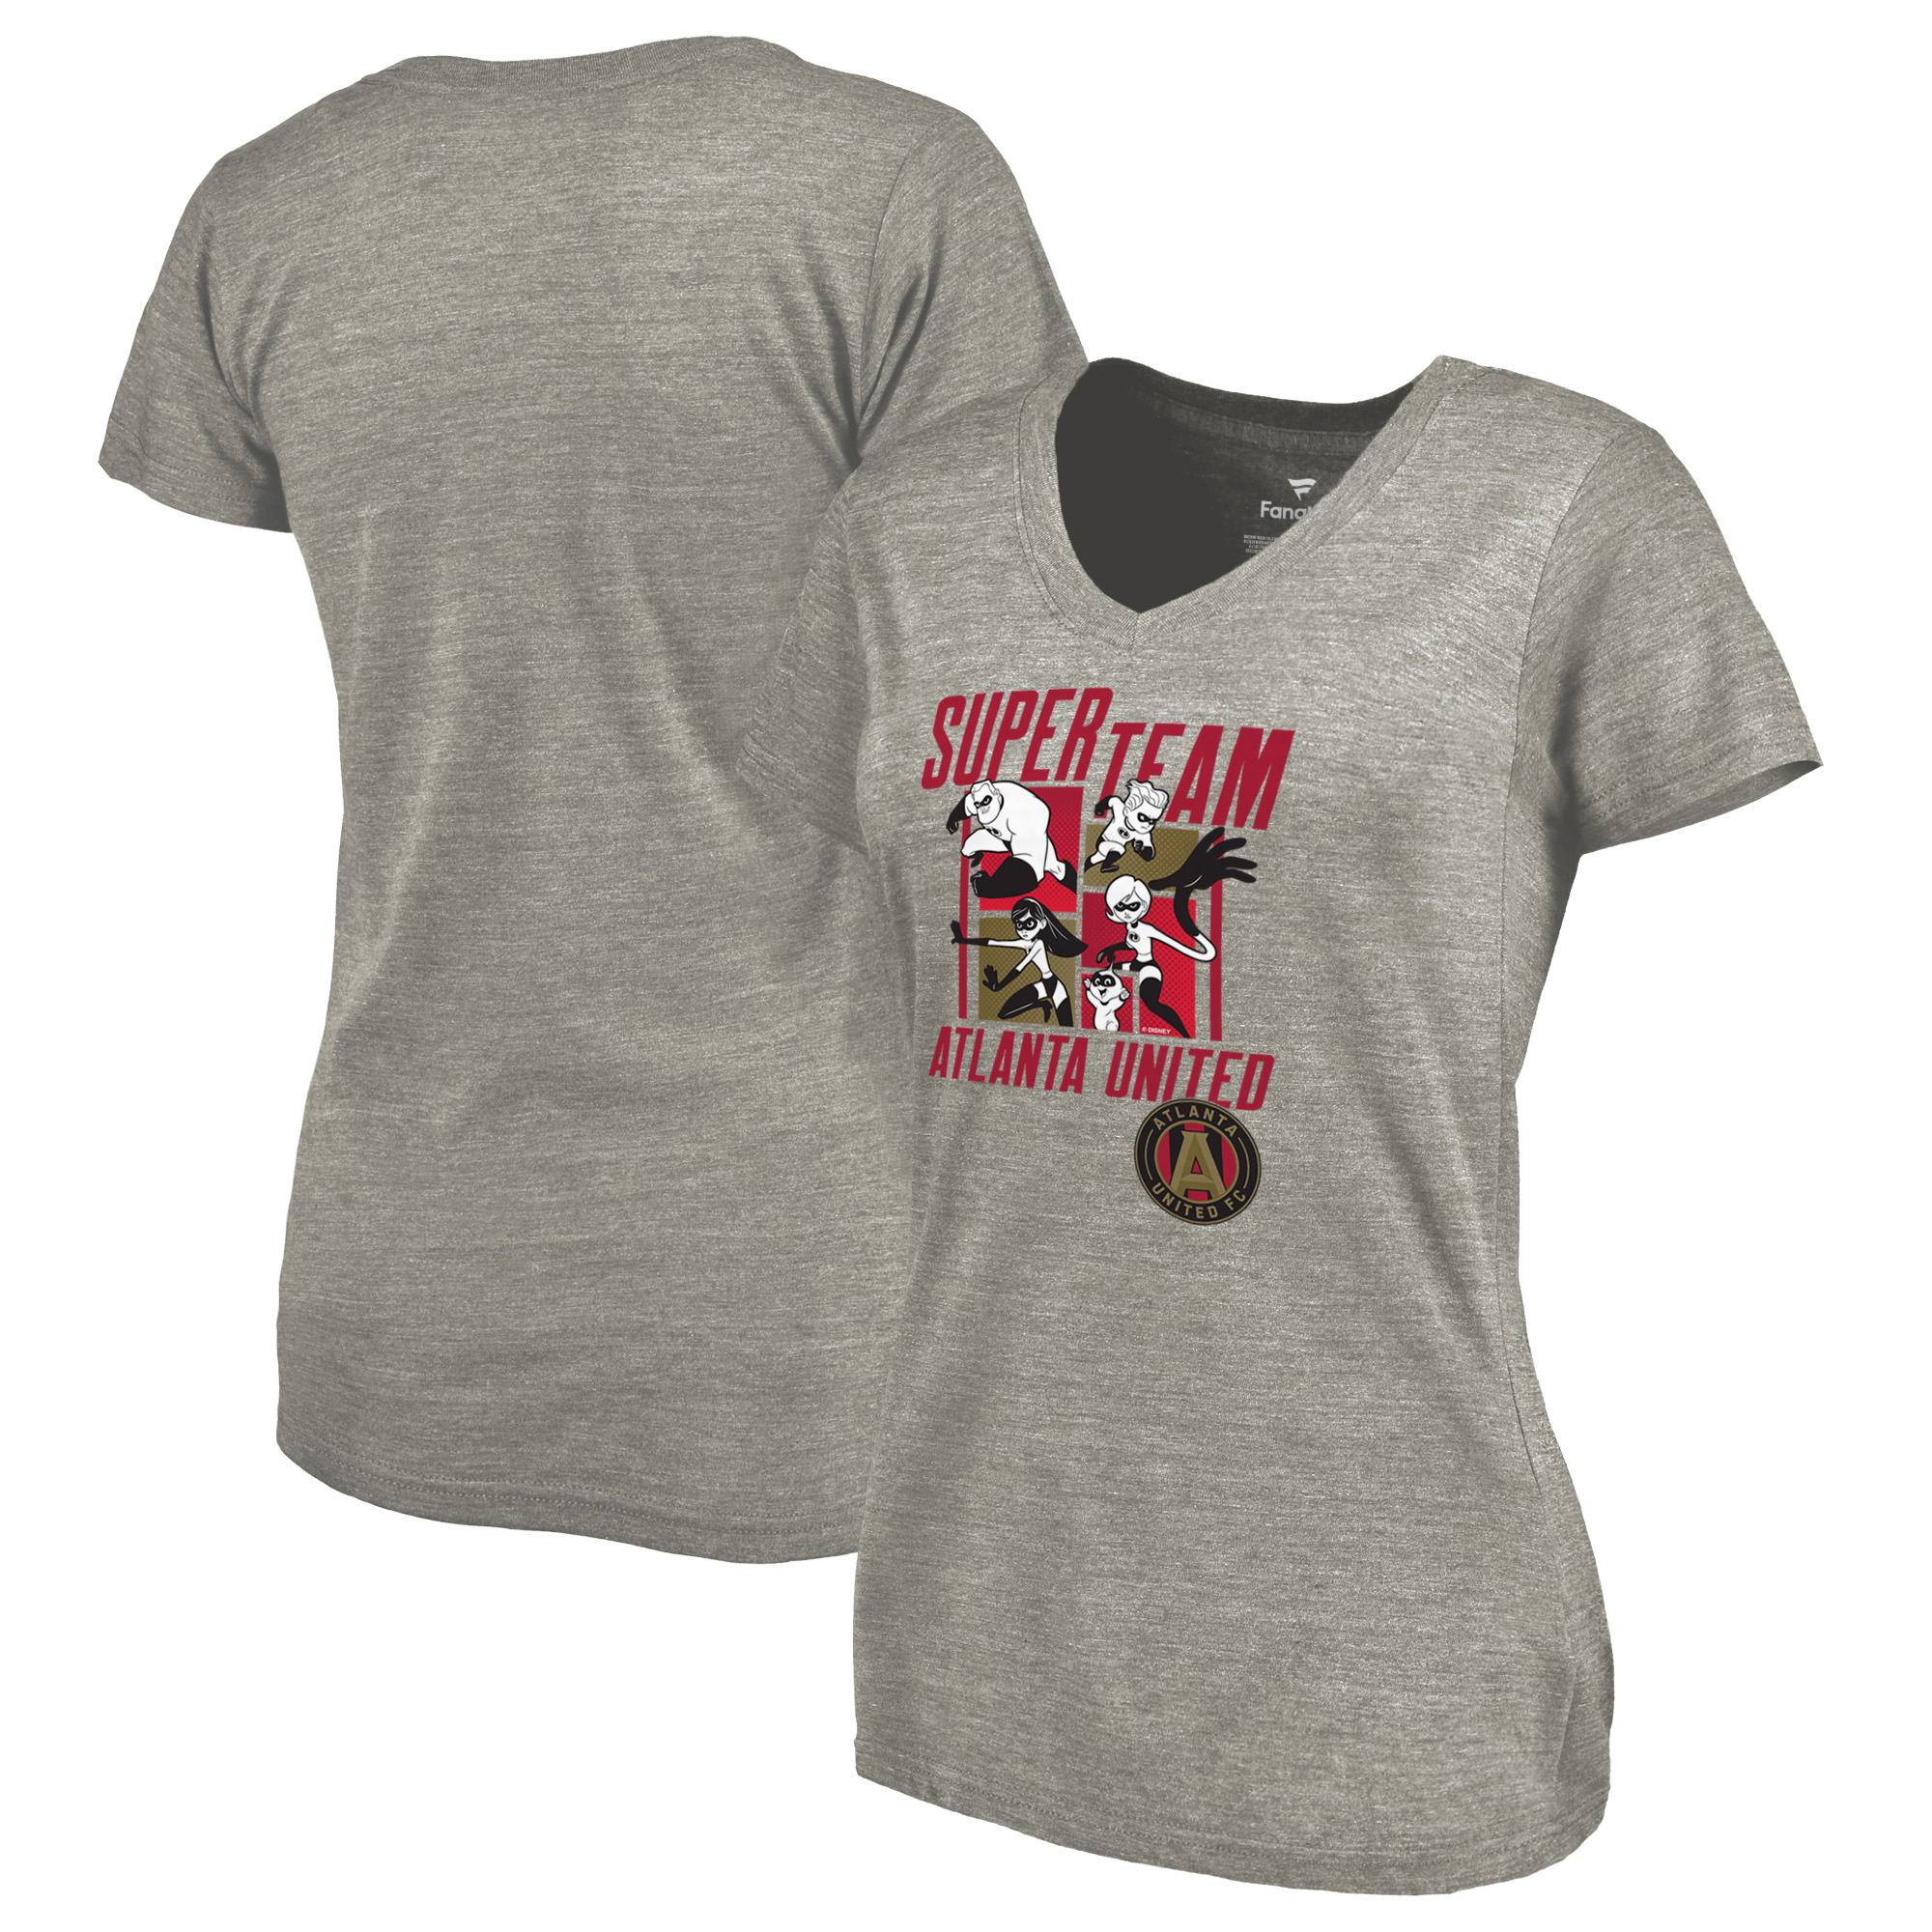 Atlanta United FC Fanatics Branded Women's Disney Pixar The Incredibles Super Team Tri-Blend V-Neck T-Shirt - Heathered Gray